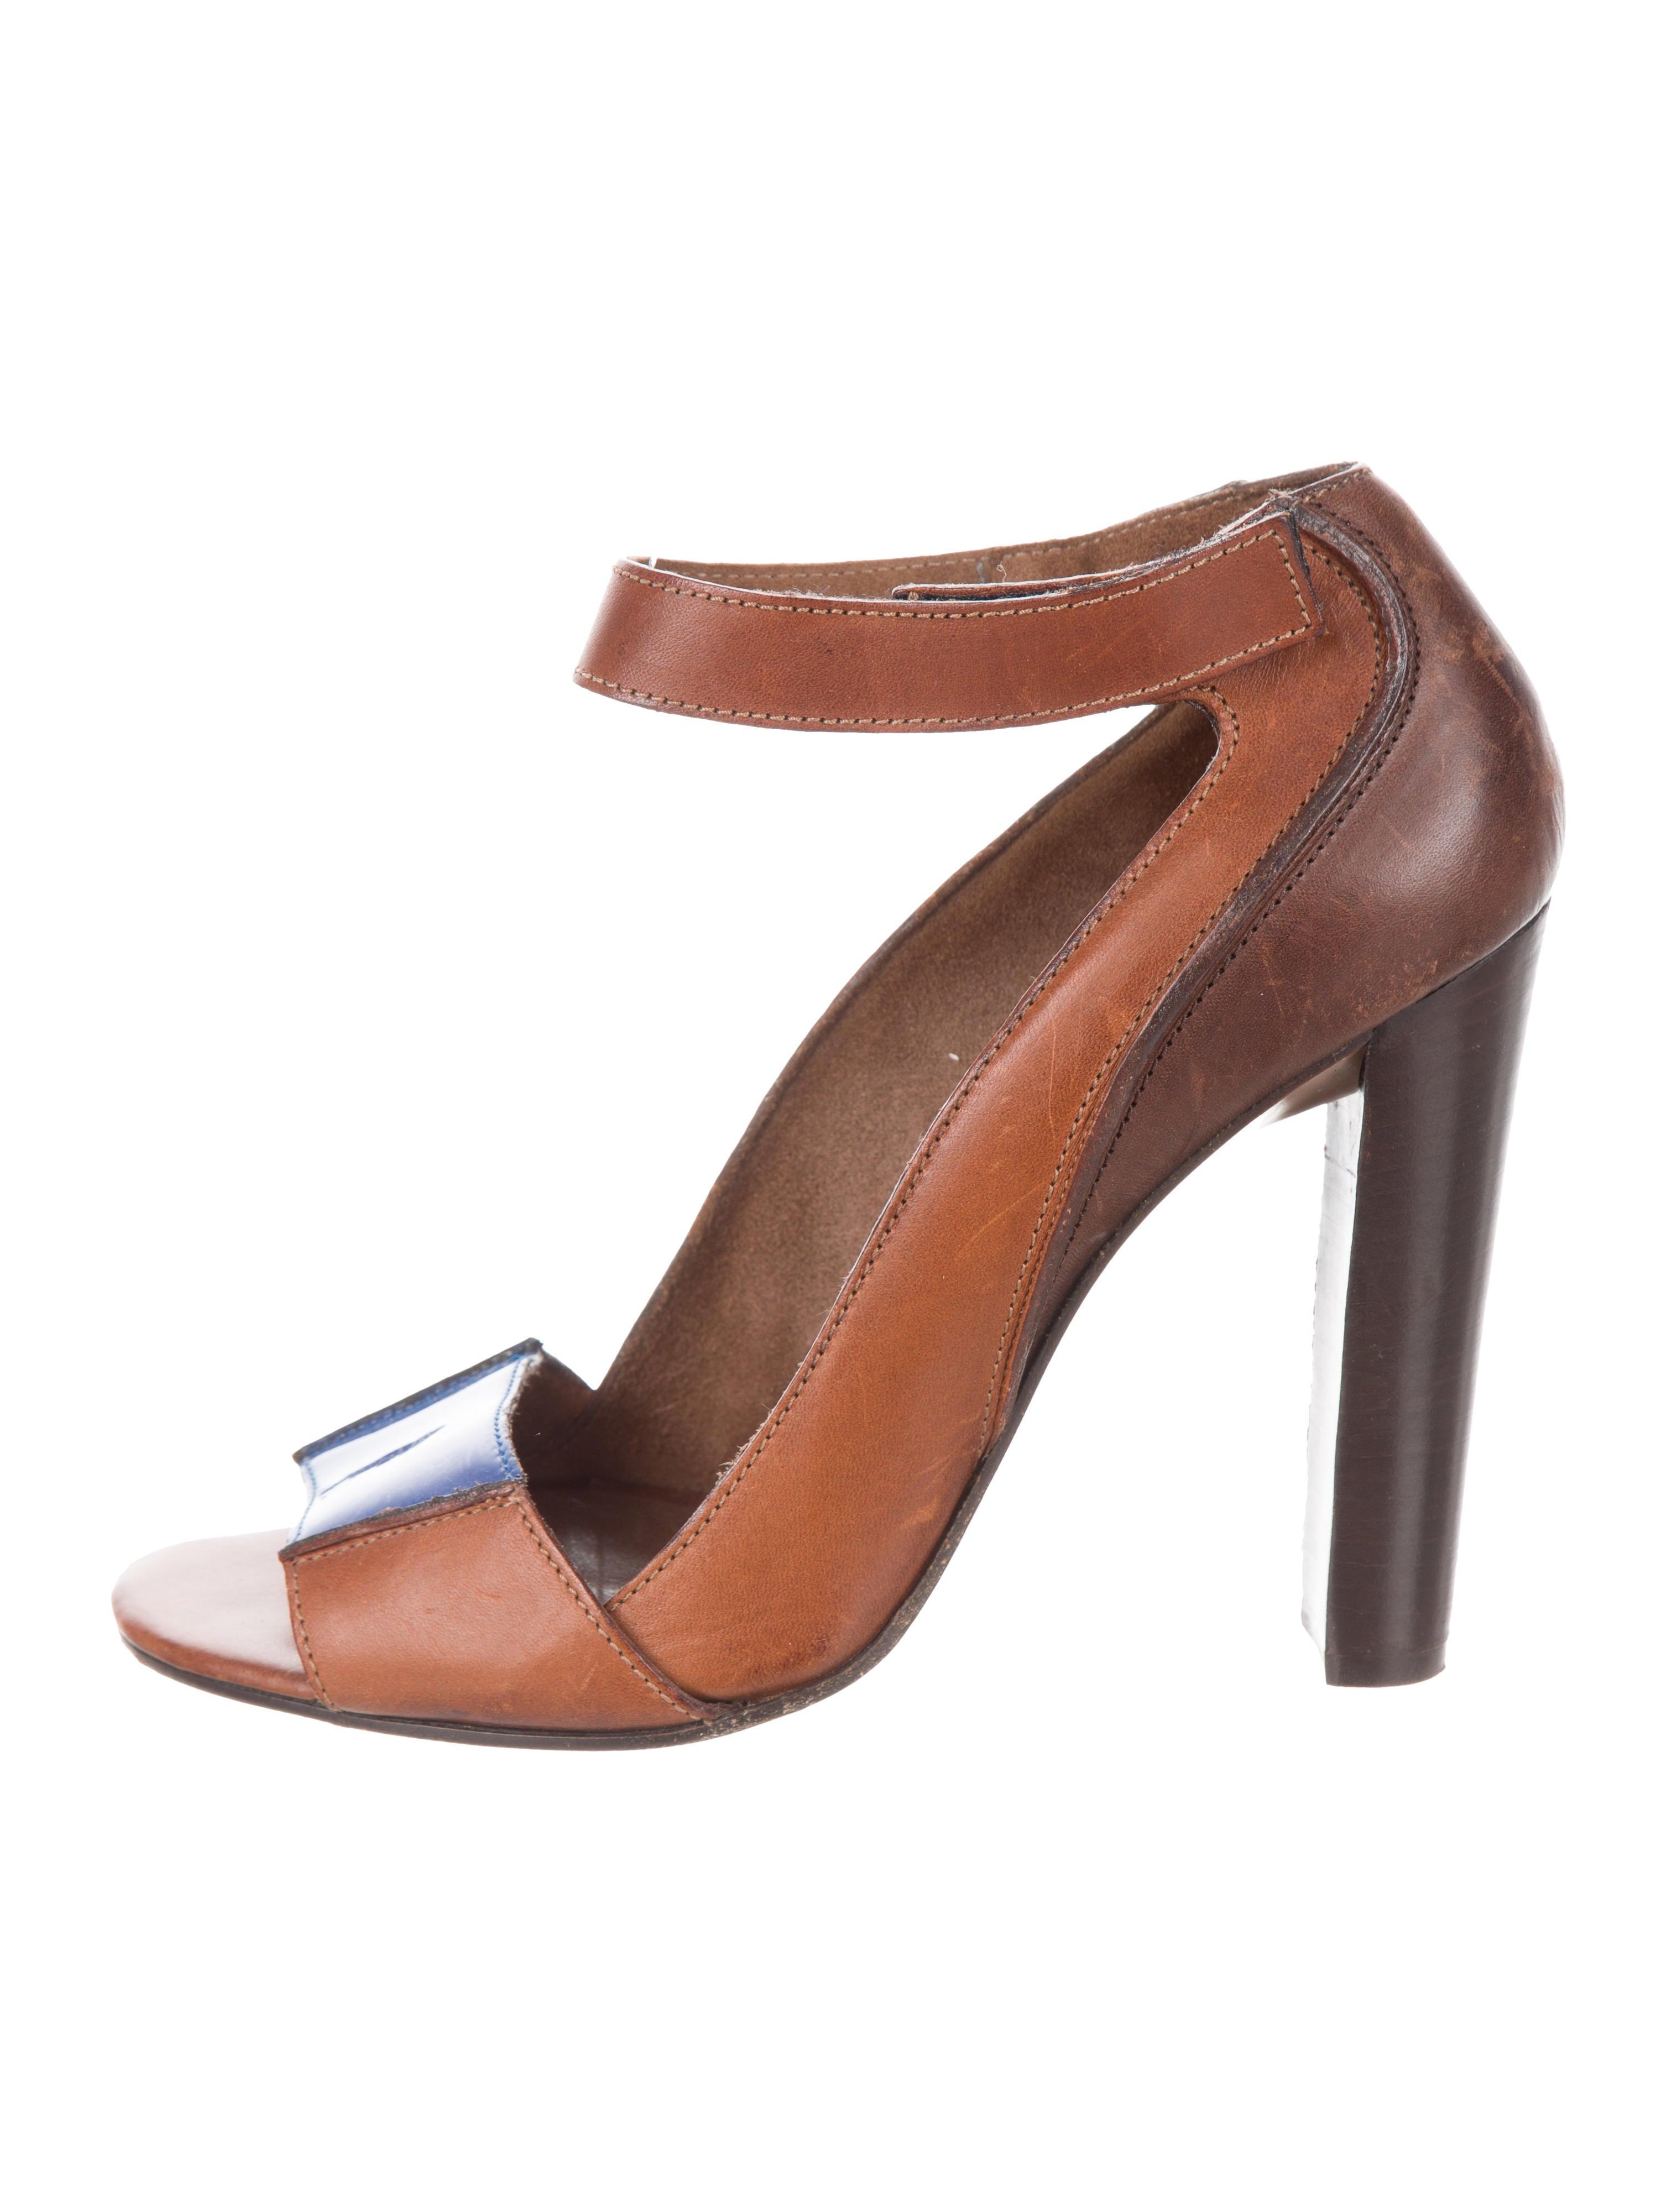 Marni Leather Peep-Toe Pumps comfortable footaction cheap official site outlet shop for y2uElSvzGP